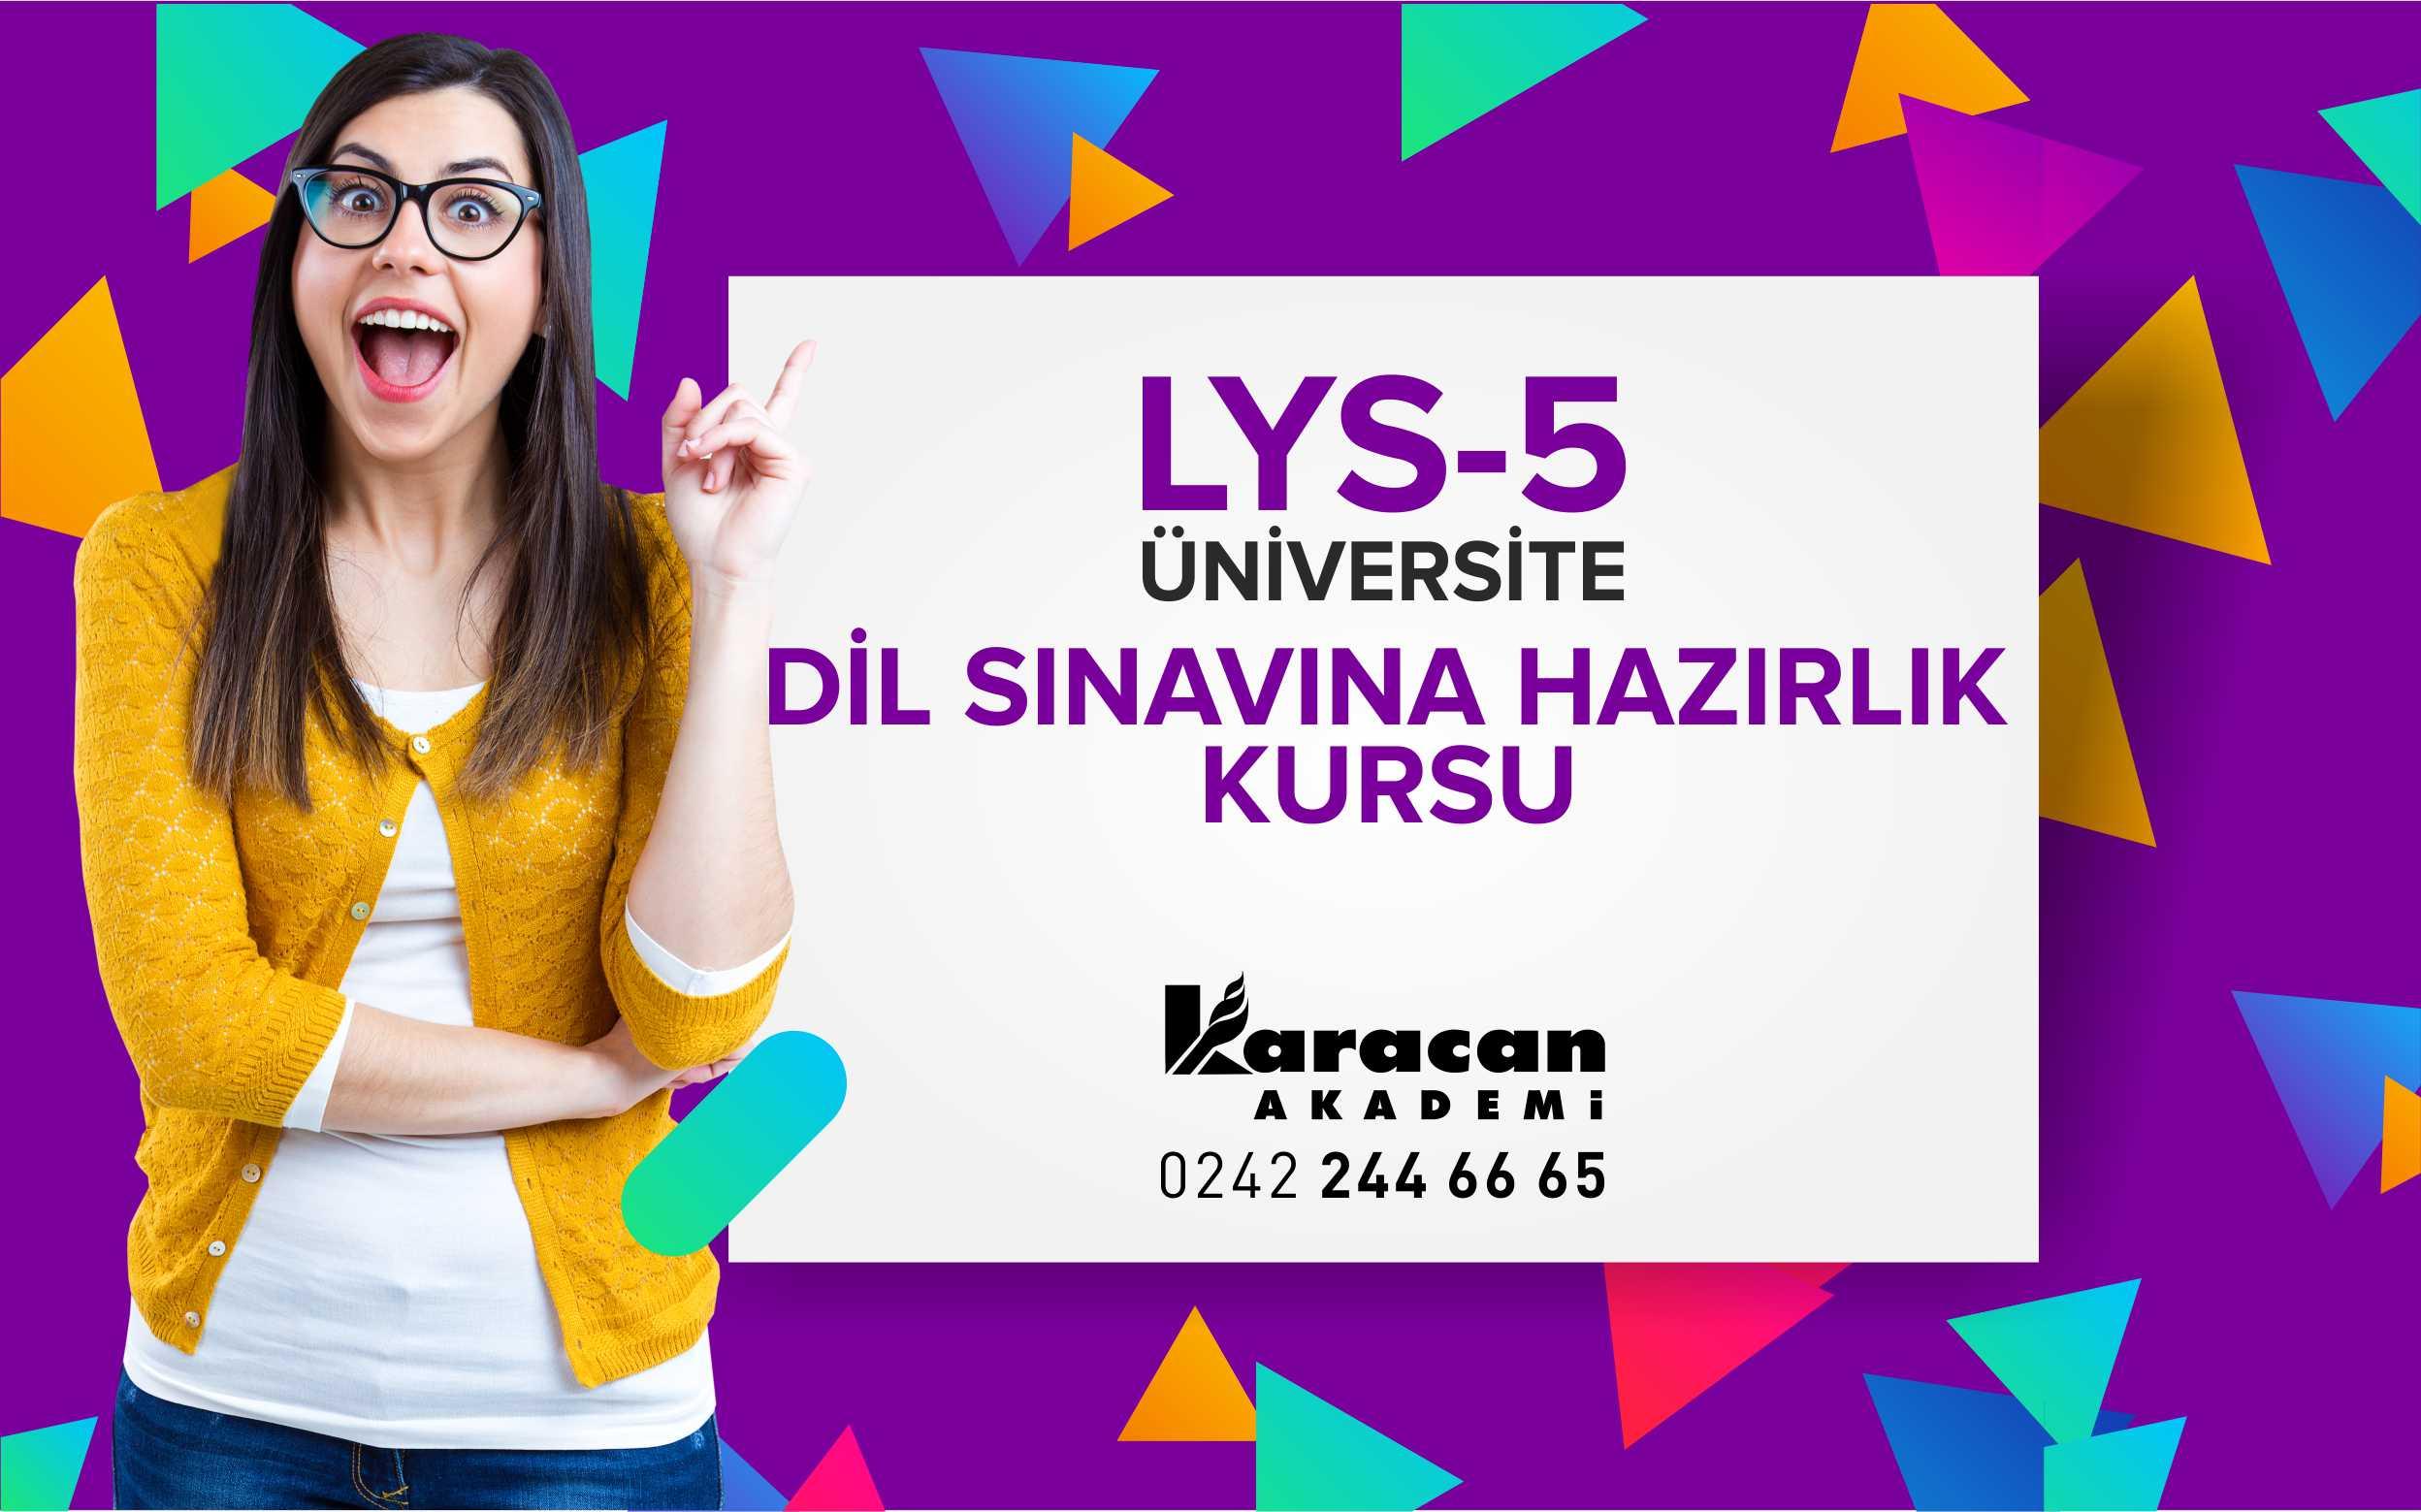 Antalya Üniversite LYS-5 Sınavına Hazırlık Kursu